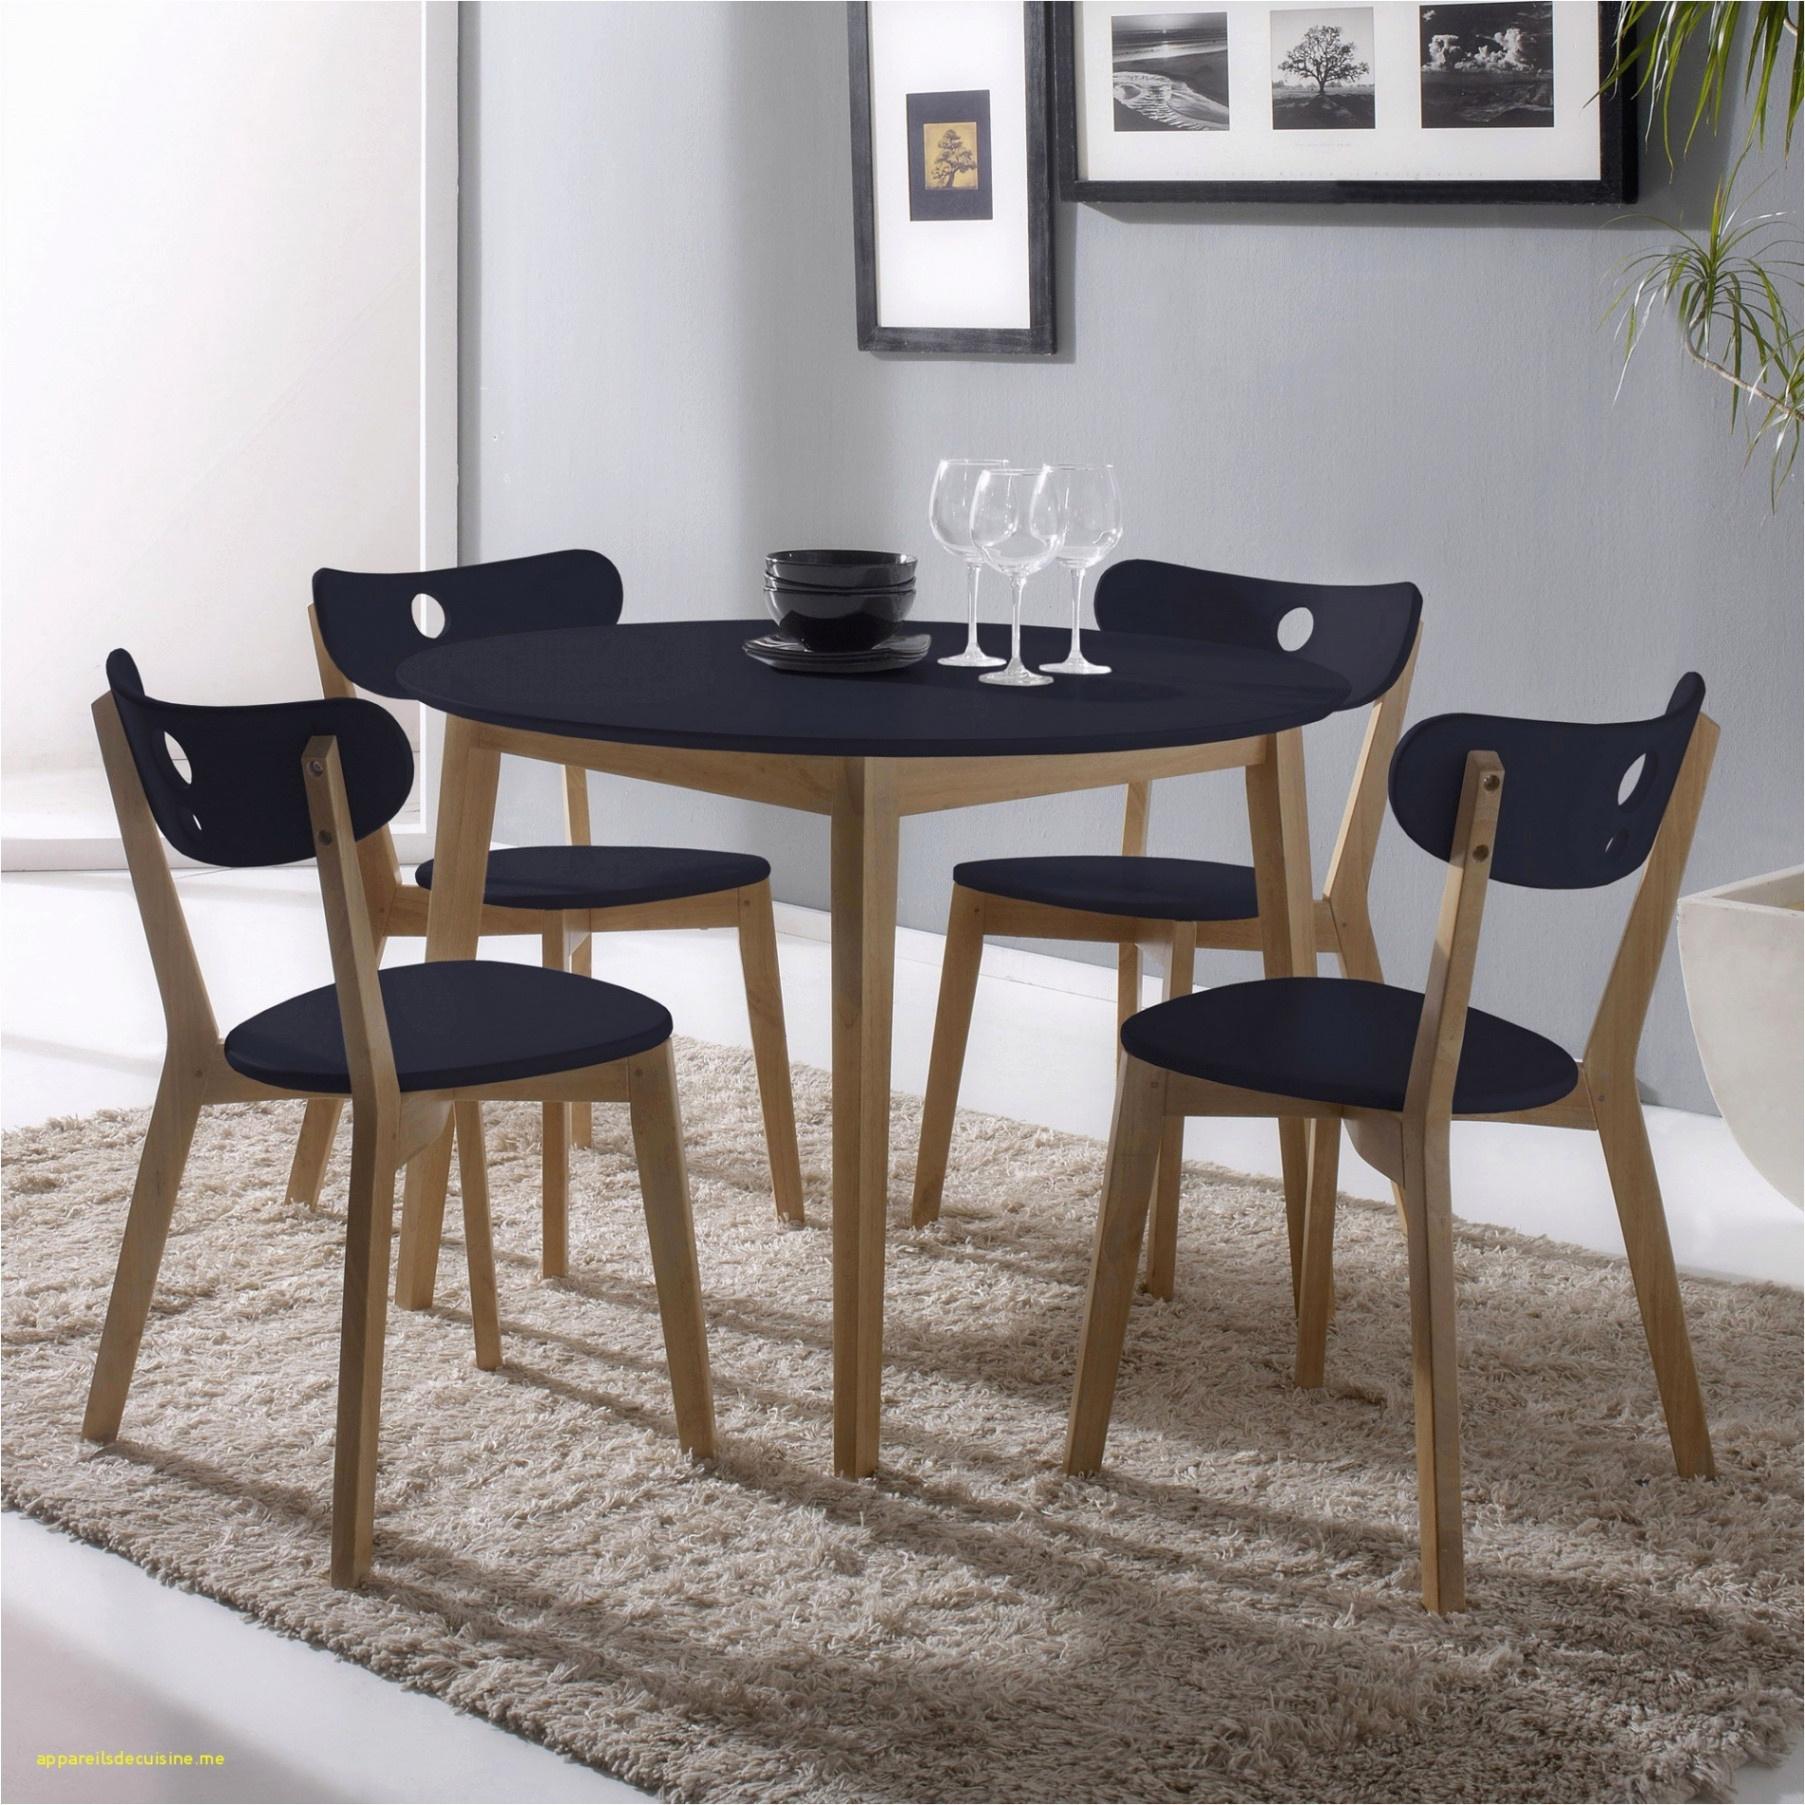 fabriquer table salle a manger impressionnant frais fabriquer table a manger idee bar steinteppich balkon 0d of fabriquer table salle a manger